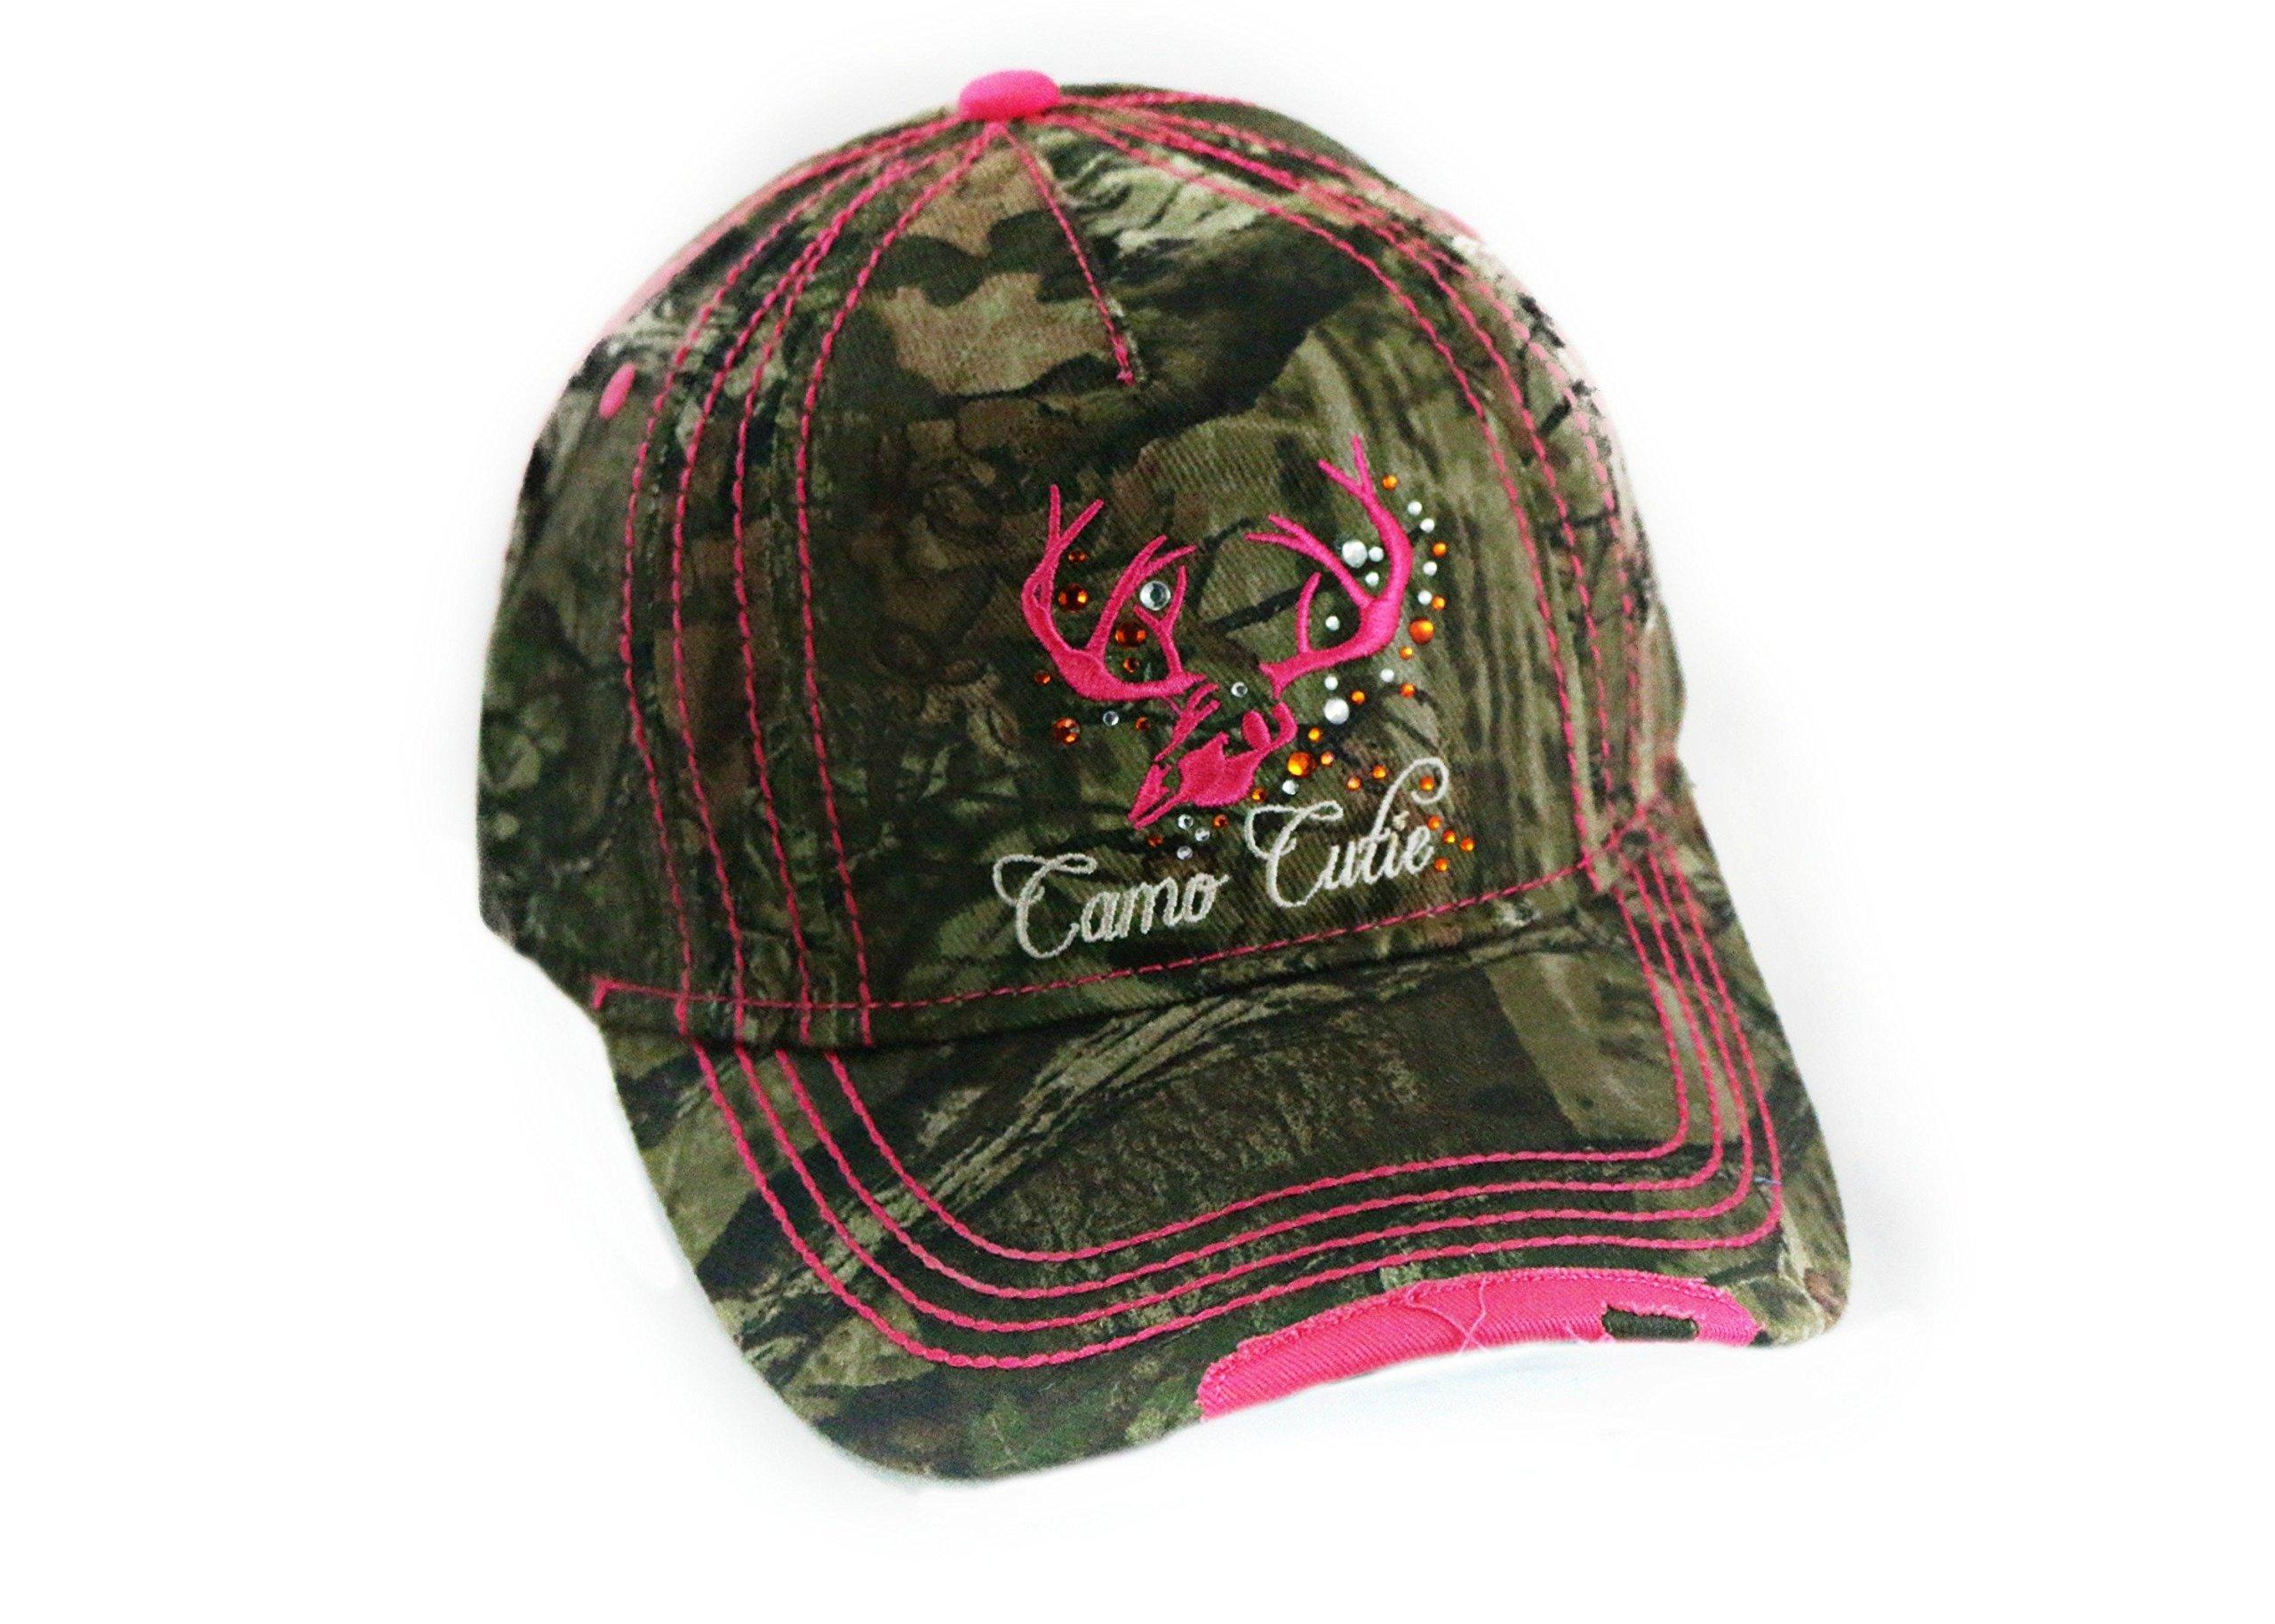 Camo Cutie Cap,Mossy Oak Camo Cap with pink Trim and logo